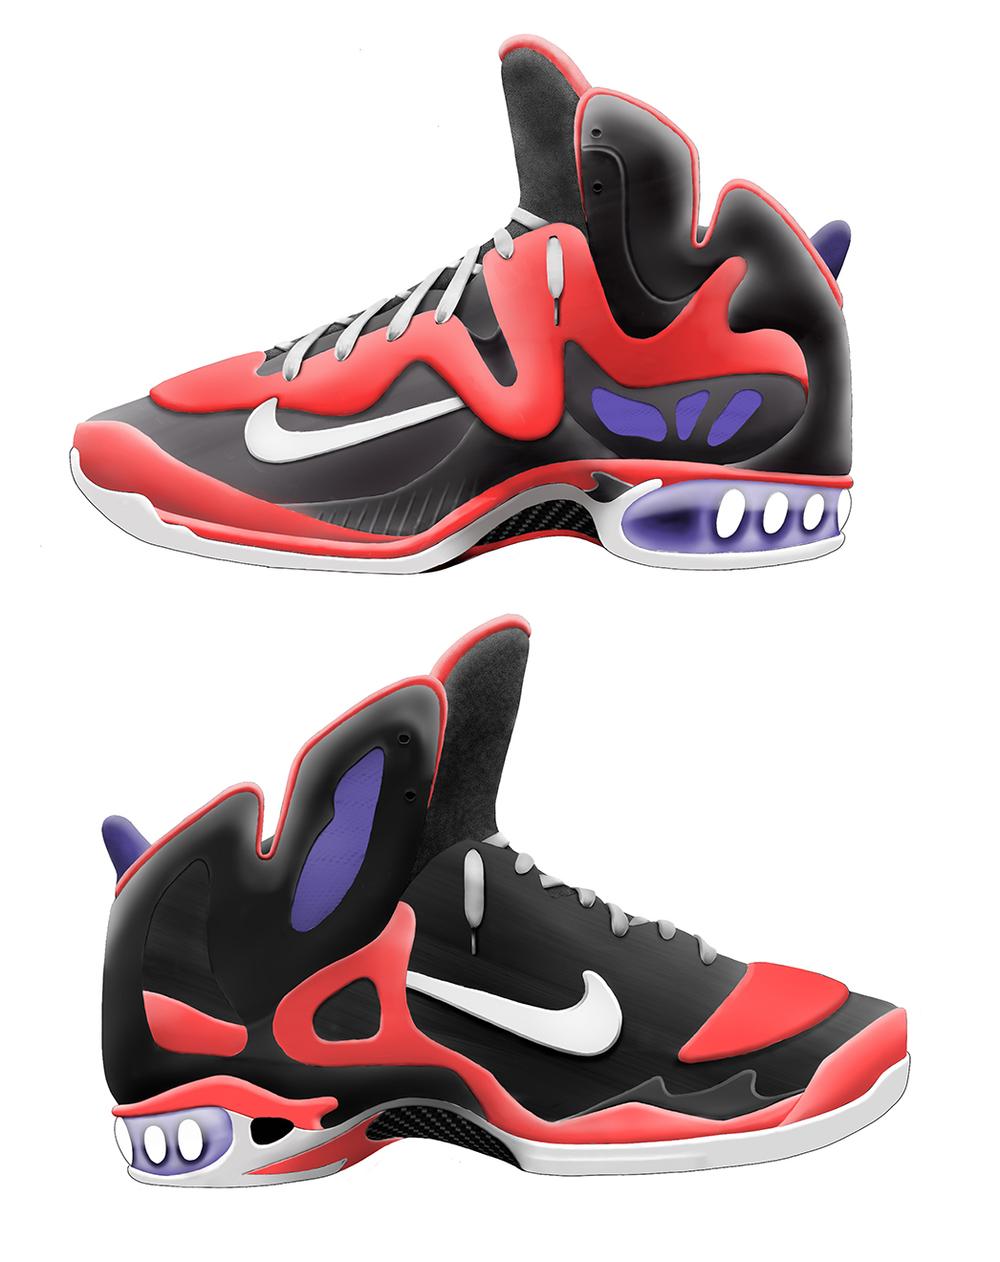 Nike Concept Shoe